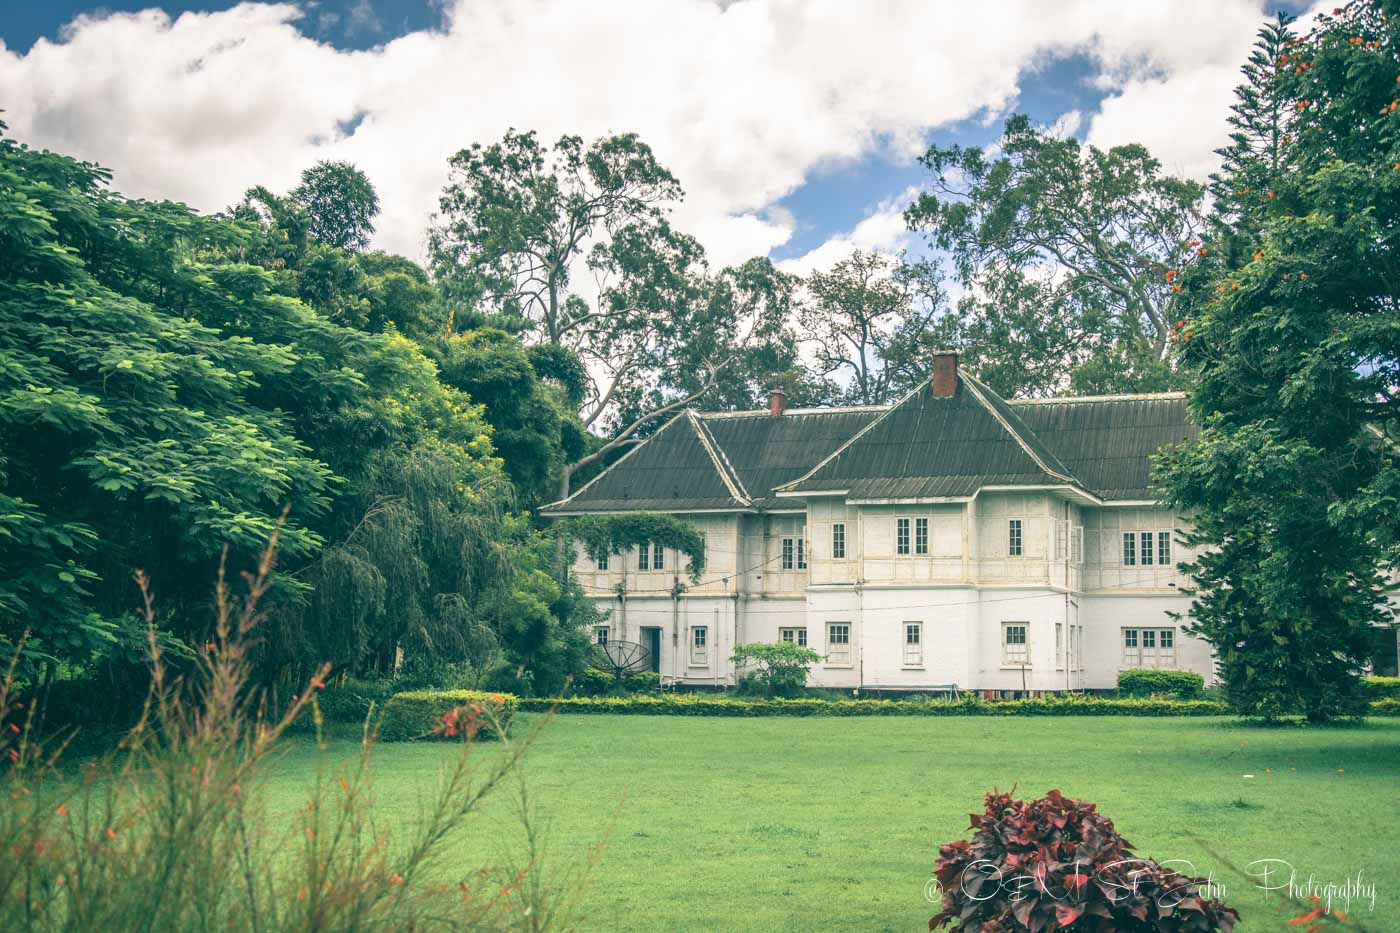 Old British colonial architeture in Pyin Oo Lwin, Myanmar